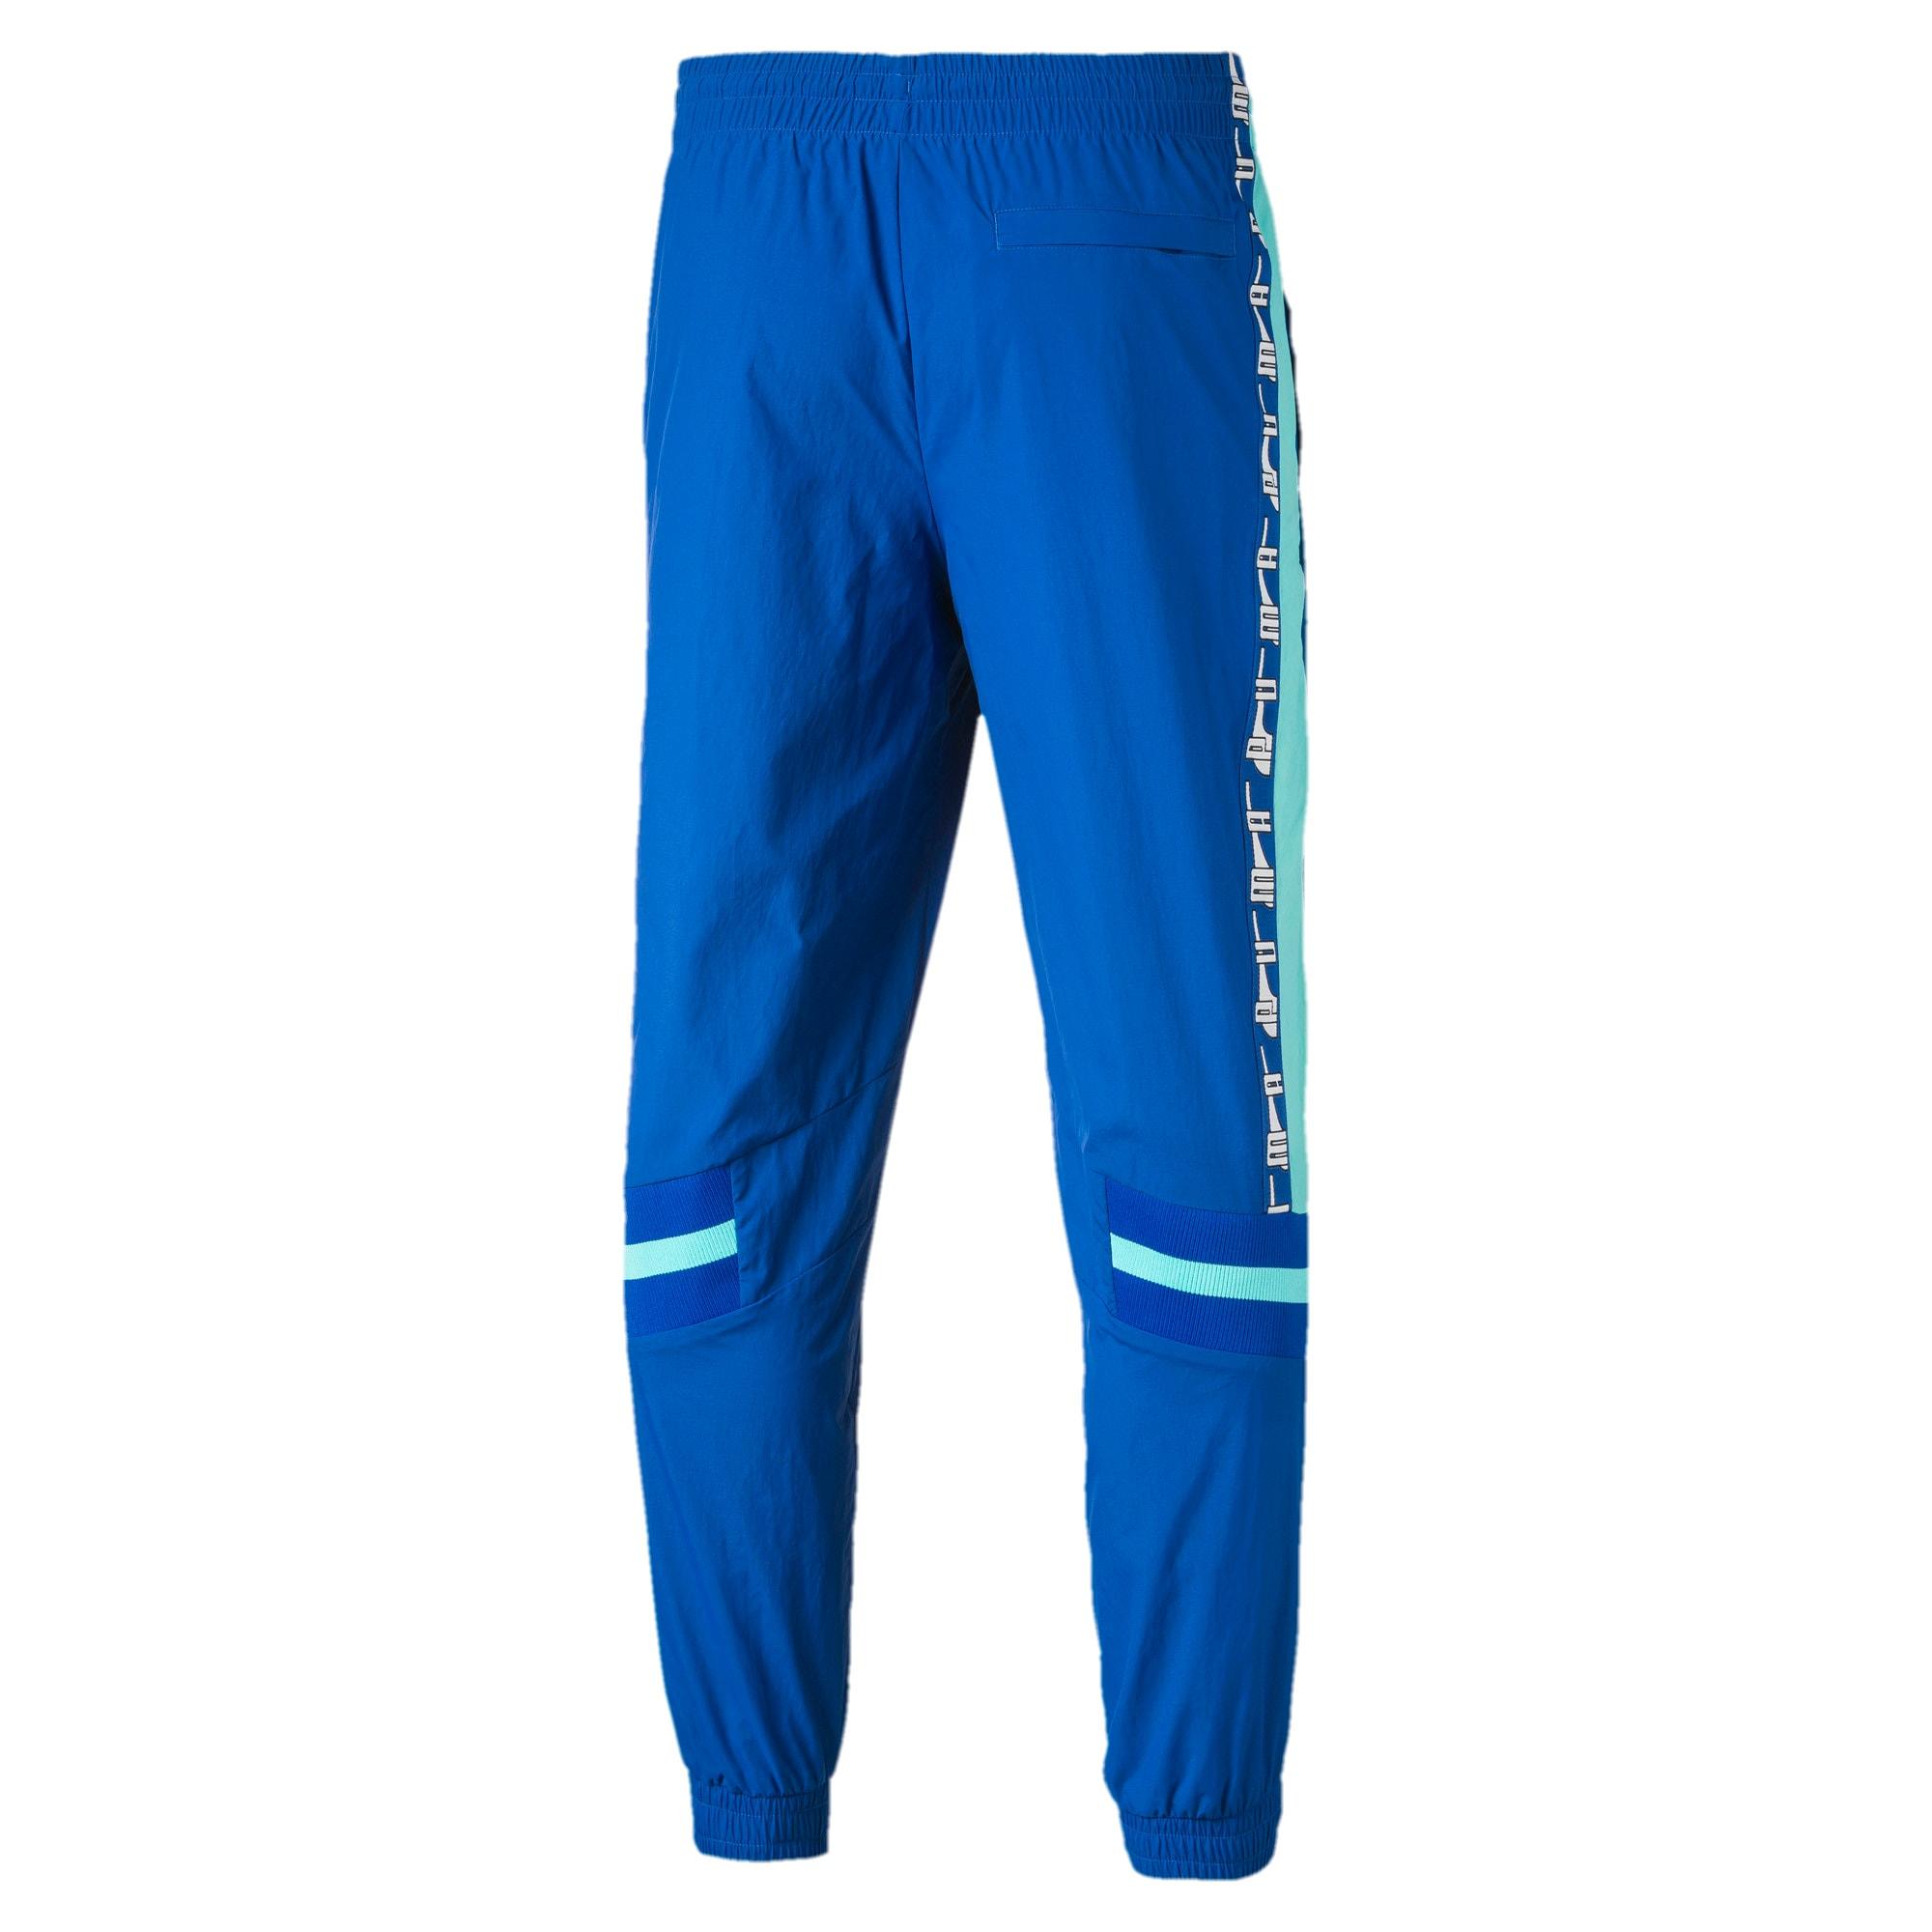 Thumbnail 5 of PUMA XTG Men's Woven Pants, Galaxy Blue, medium